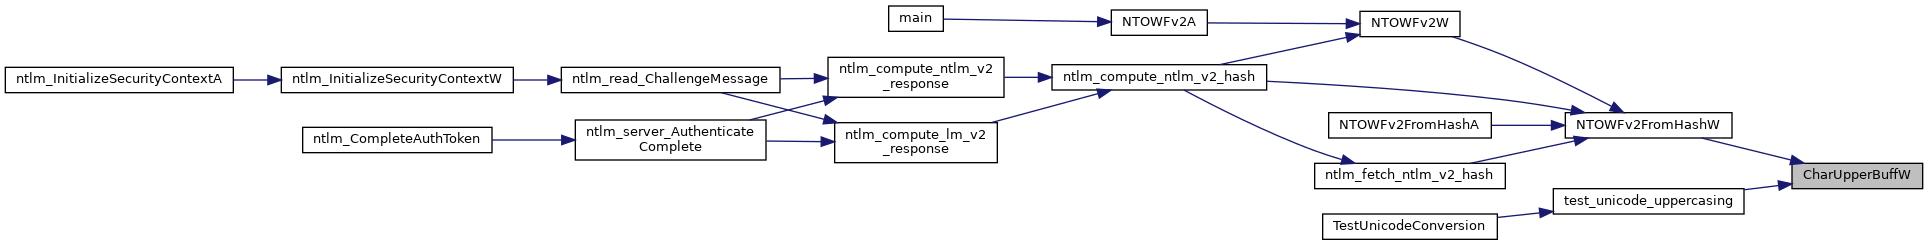 FreeRDP: string h File Reference